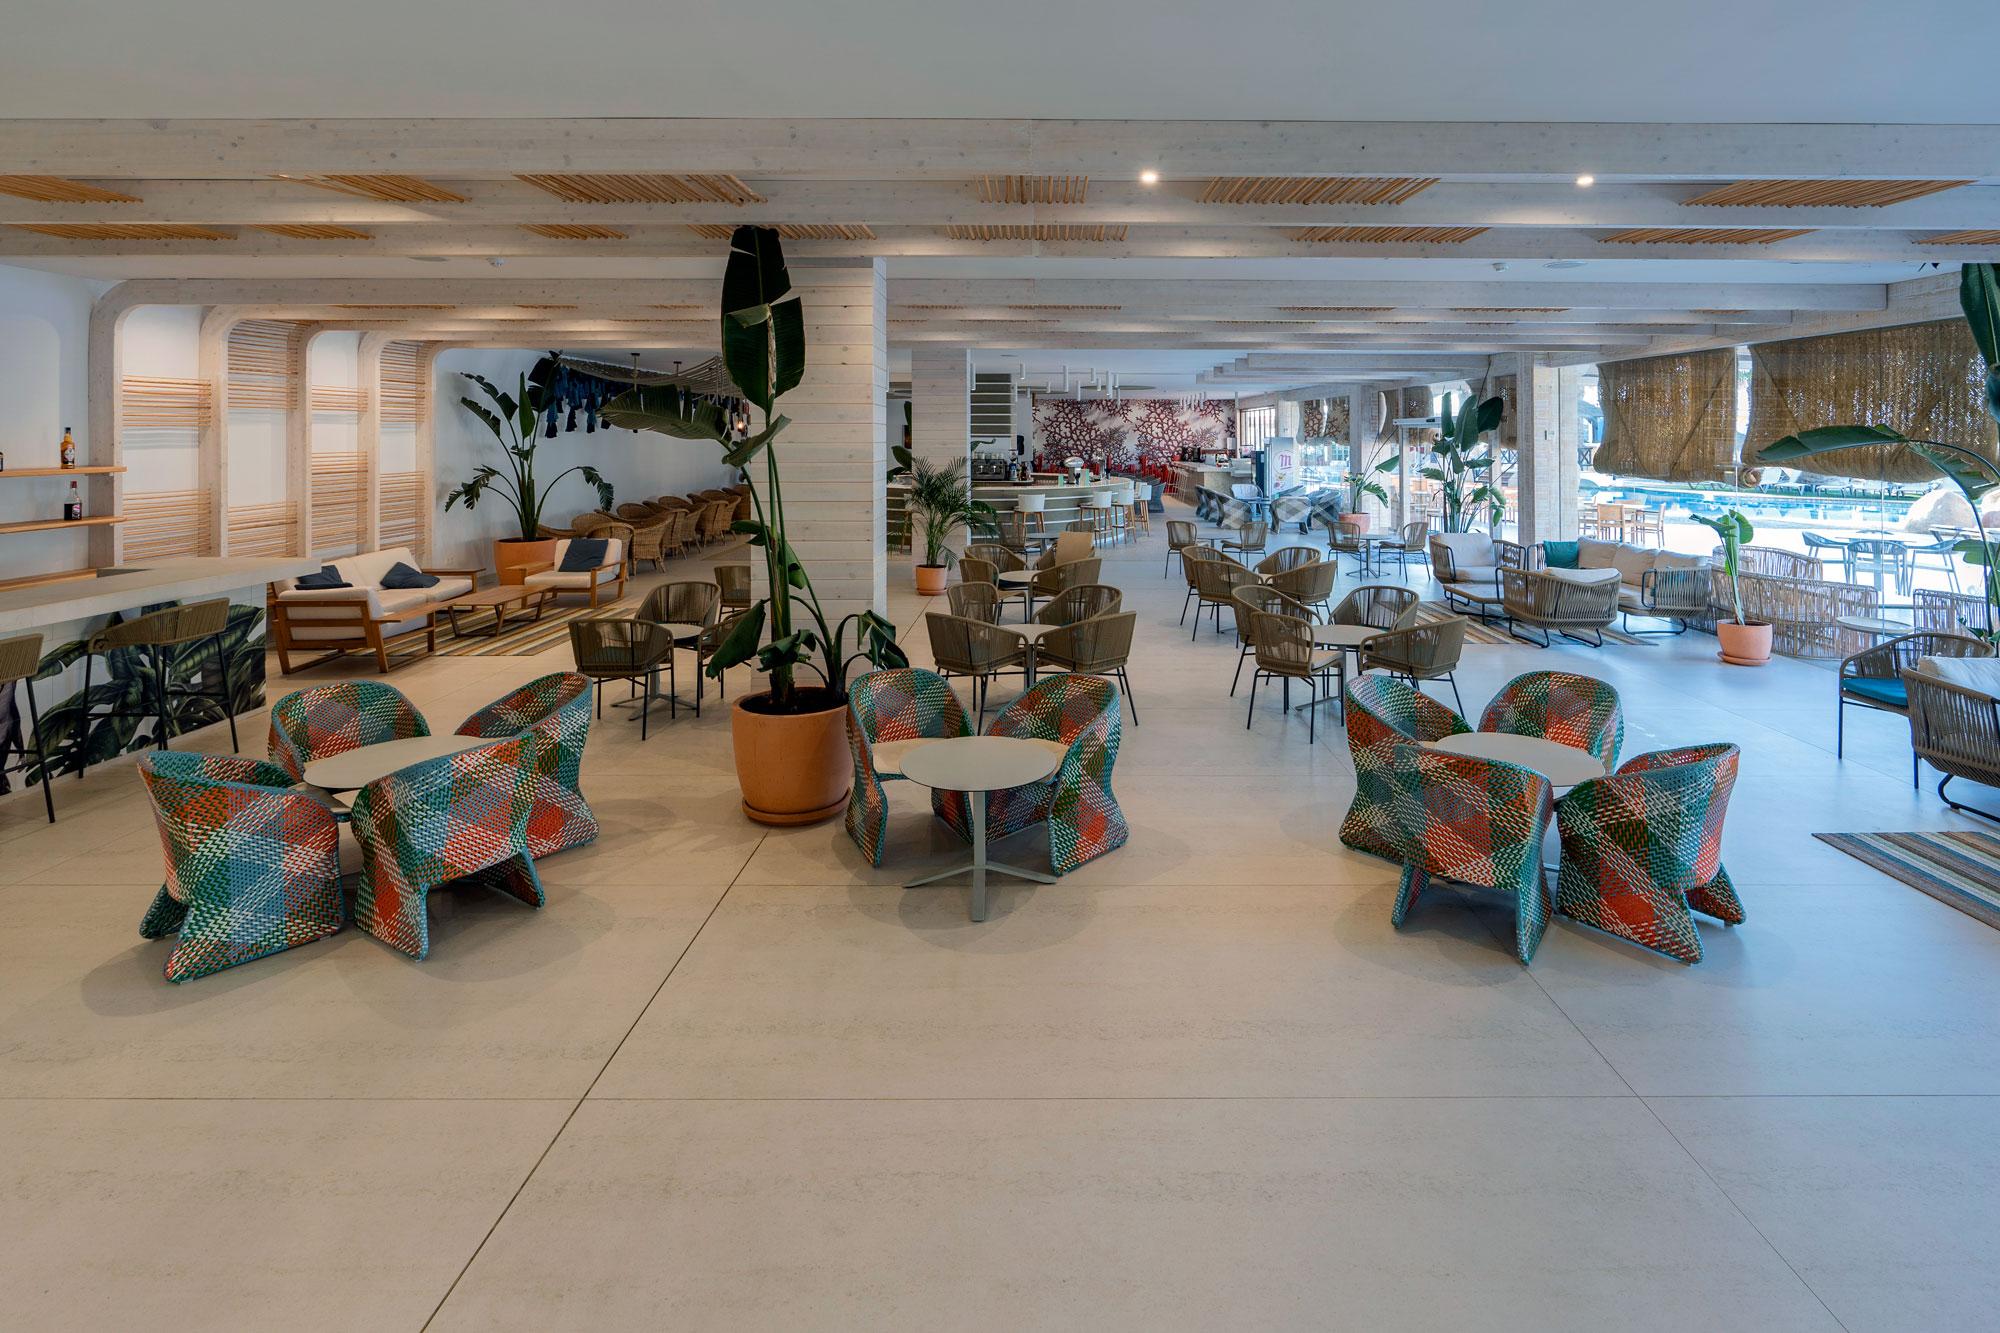 Hotel Mediterráneo  - Hotel Mediterraneo Park 8 Dekton Silestone Piedra Natural Cosentino 51